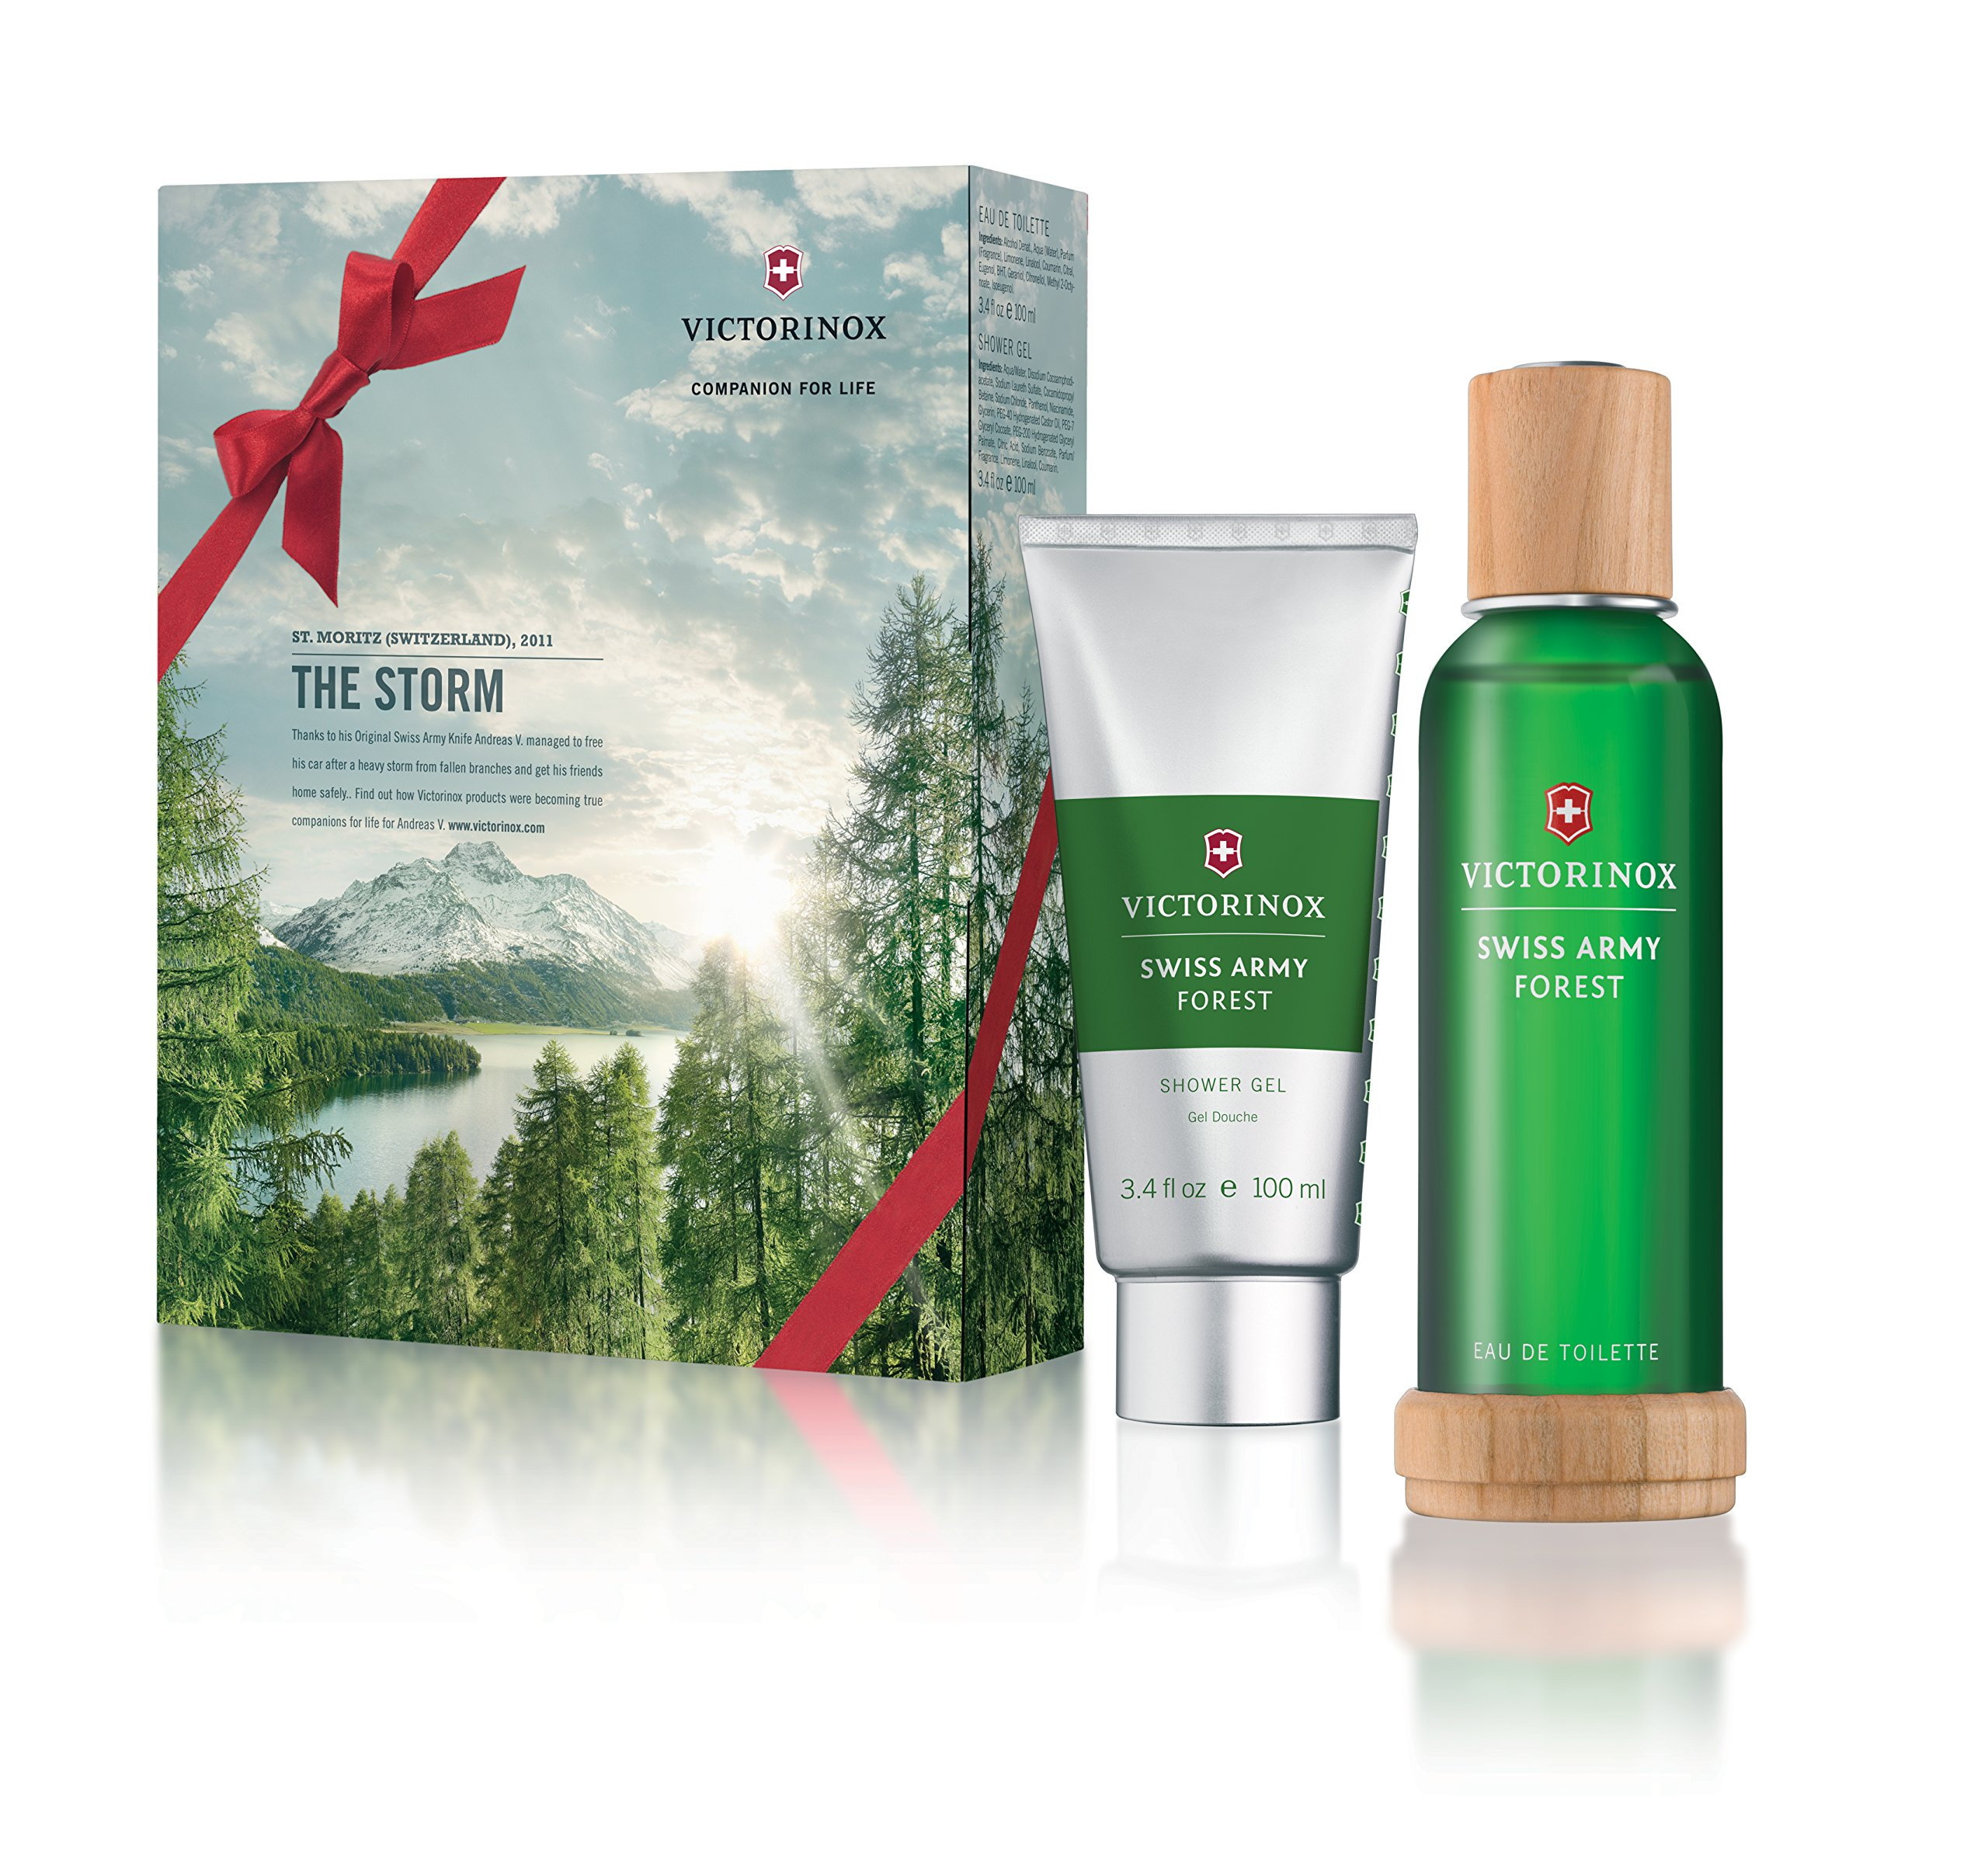 Victorinox Swiss Army Forest Eau de Toilette 3.4 Ounce Gift Set with Shower Gel